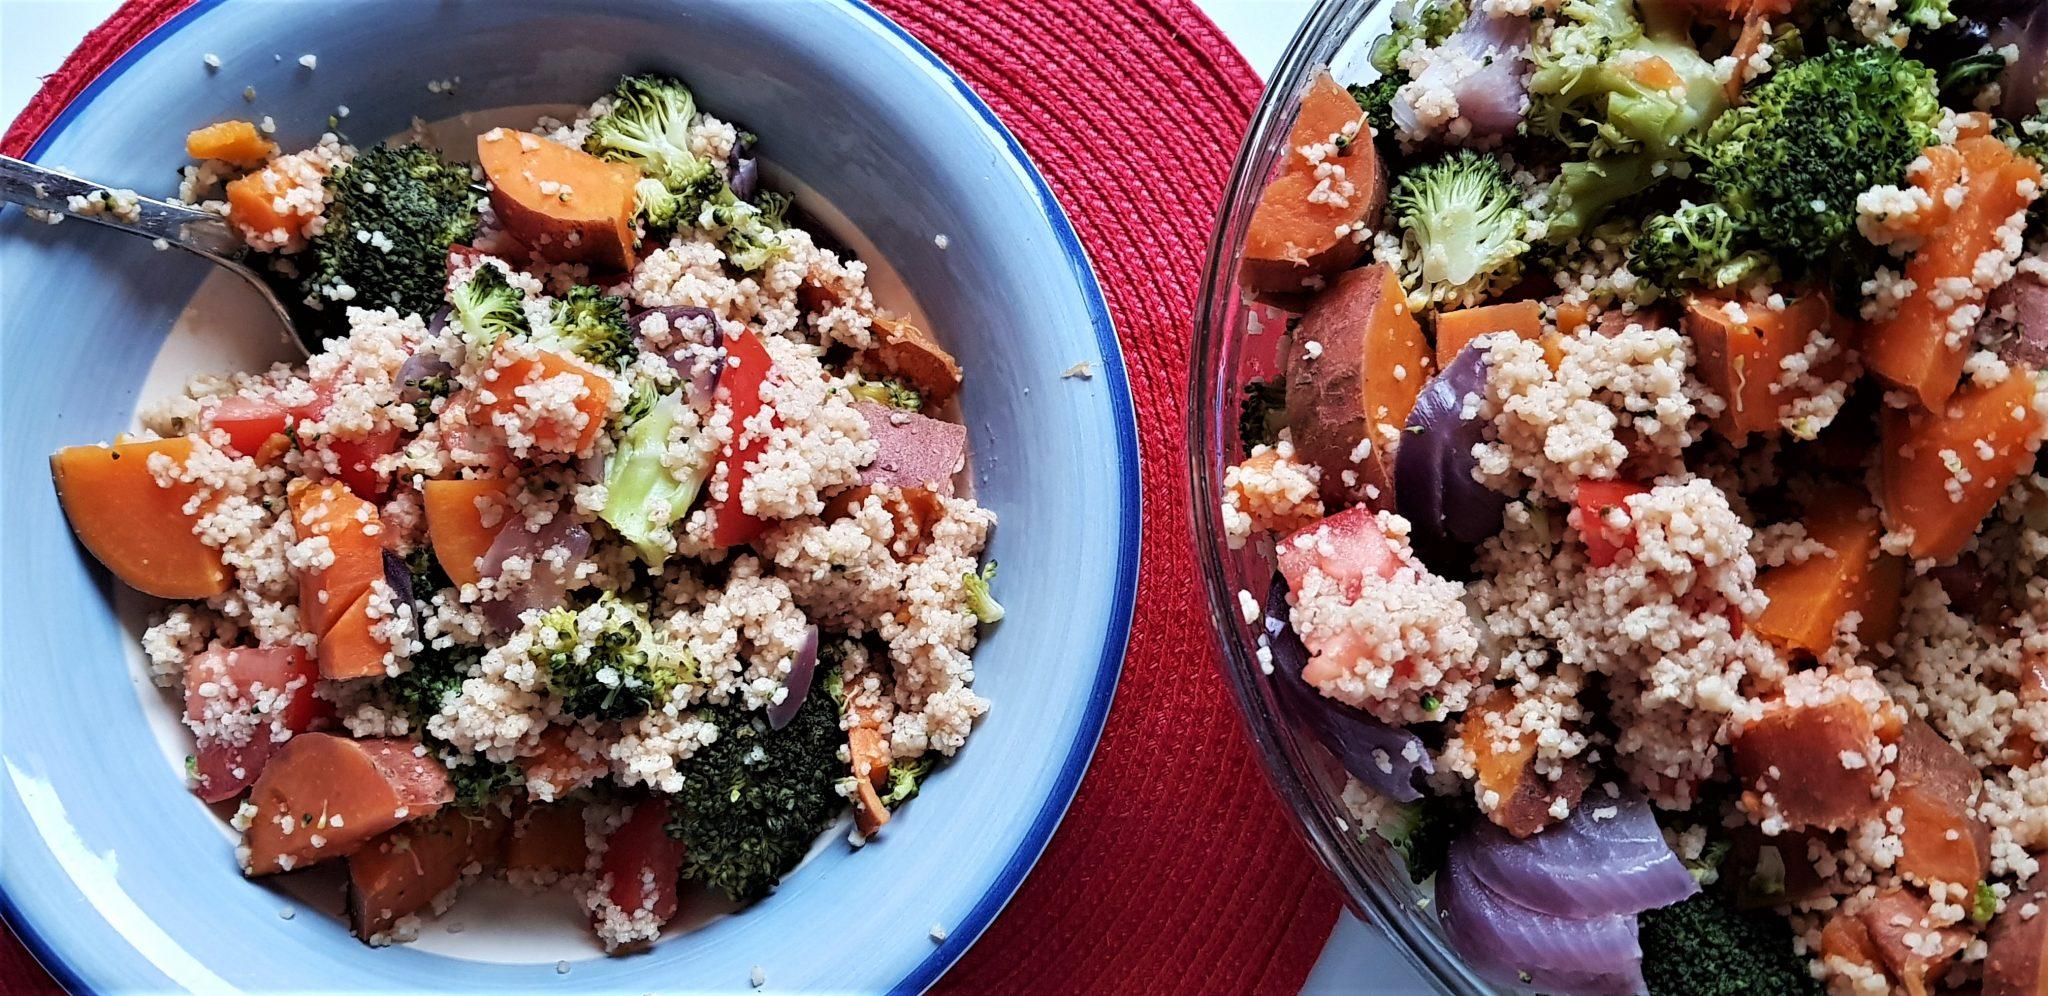 Sweet Potato, Broccoli and Tomato Couscous